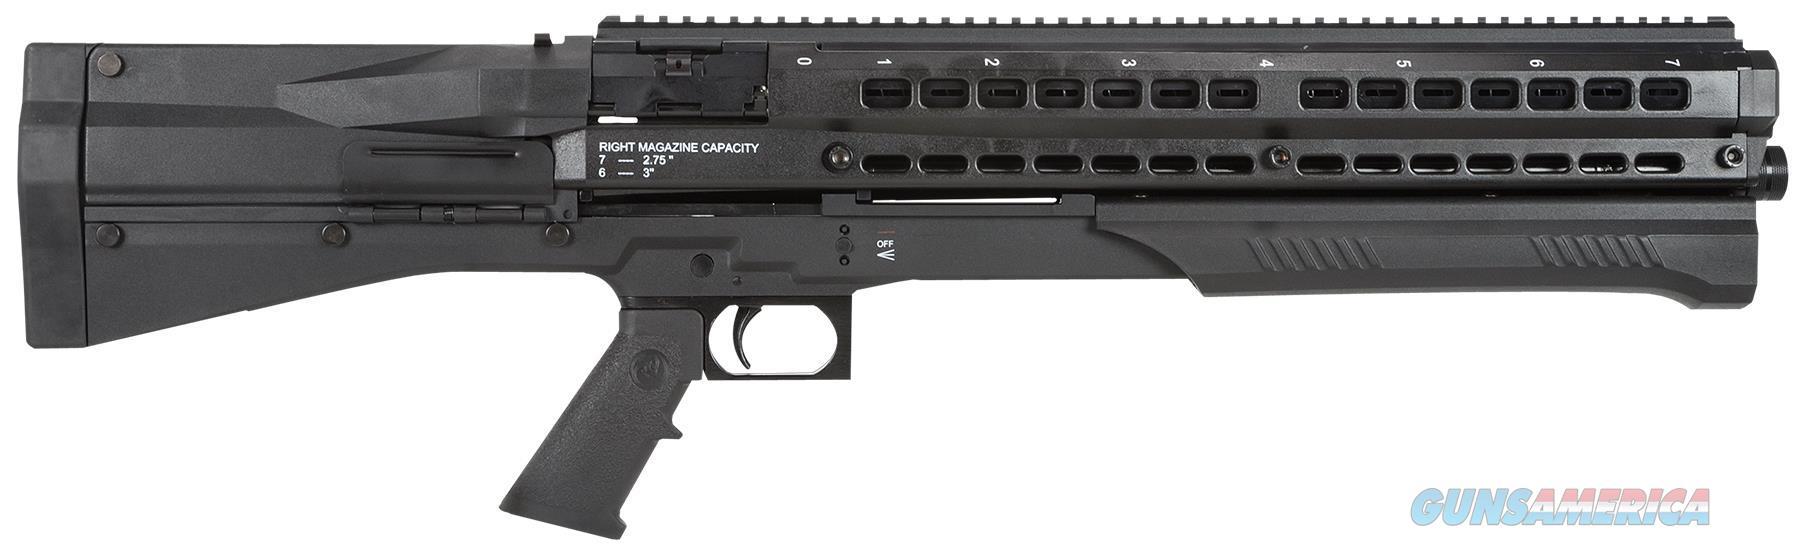 Utas Uts 7+7 12Ga 15Rd Blk Compliant PS1CM1  Guns > Shotguns > TU Misc Shotguns